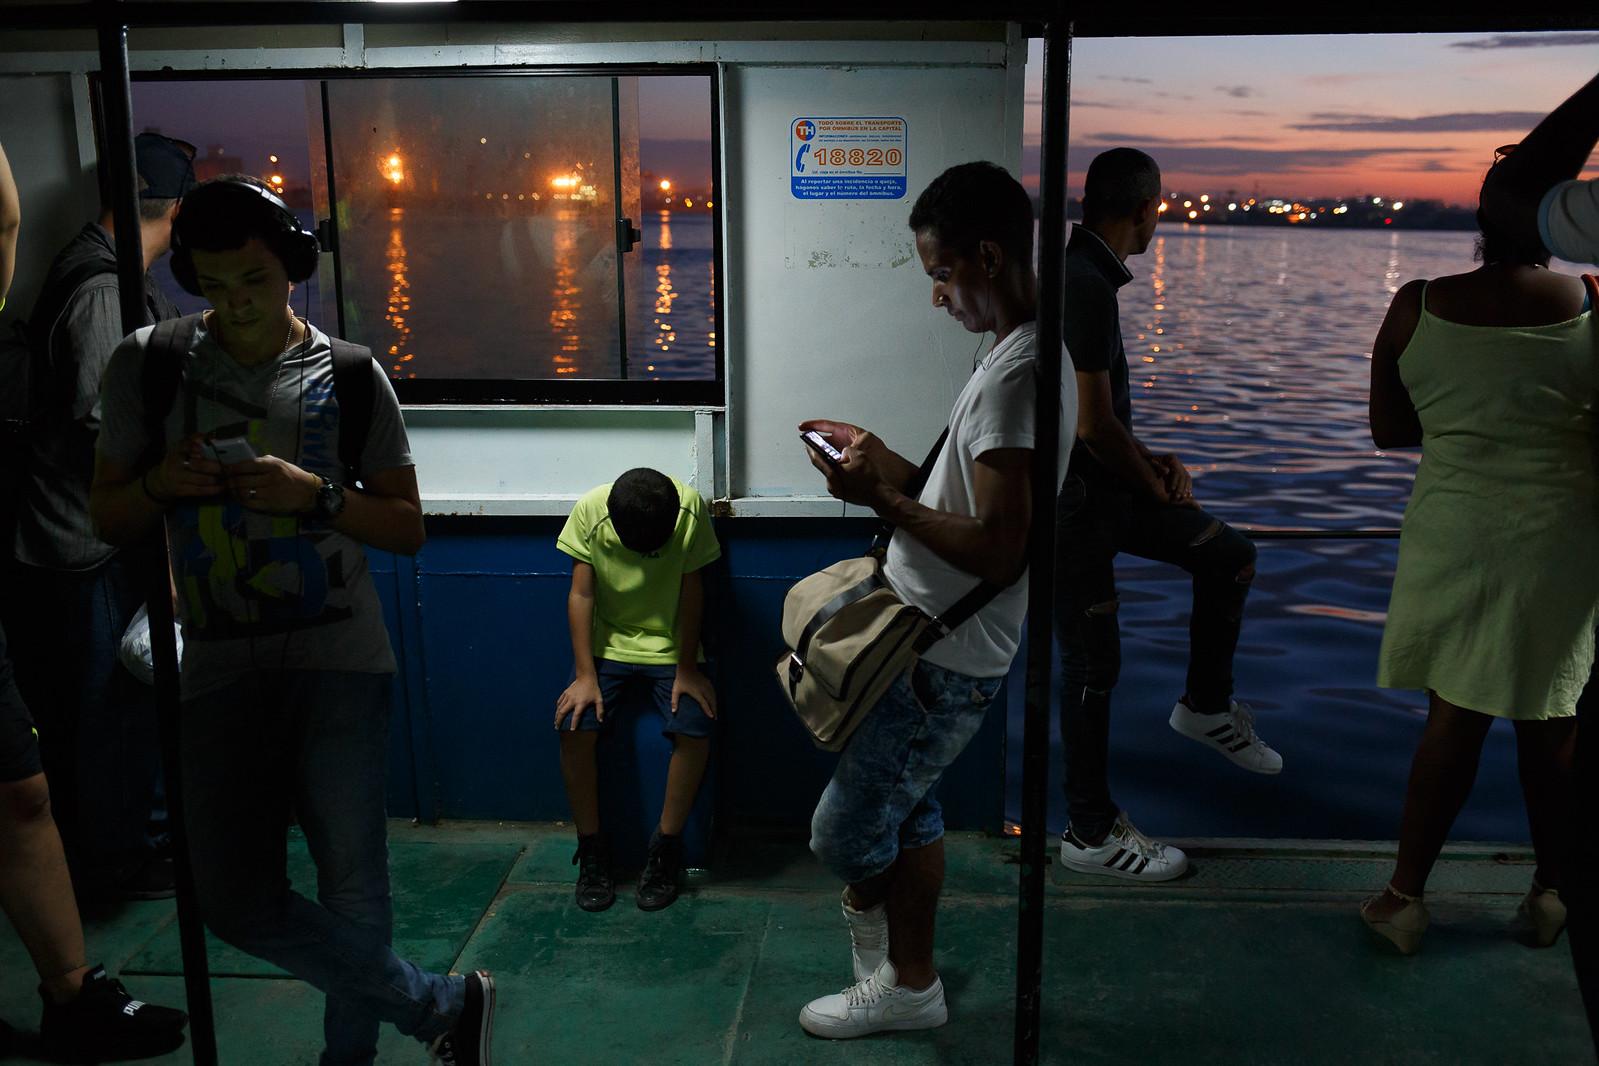 La Habana, Cuba, 2017 | by jaumescar